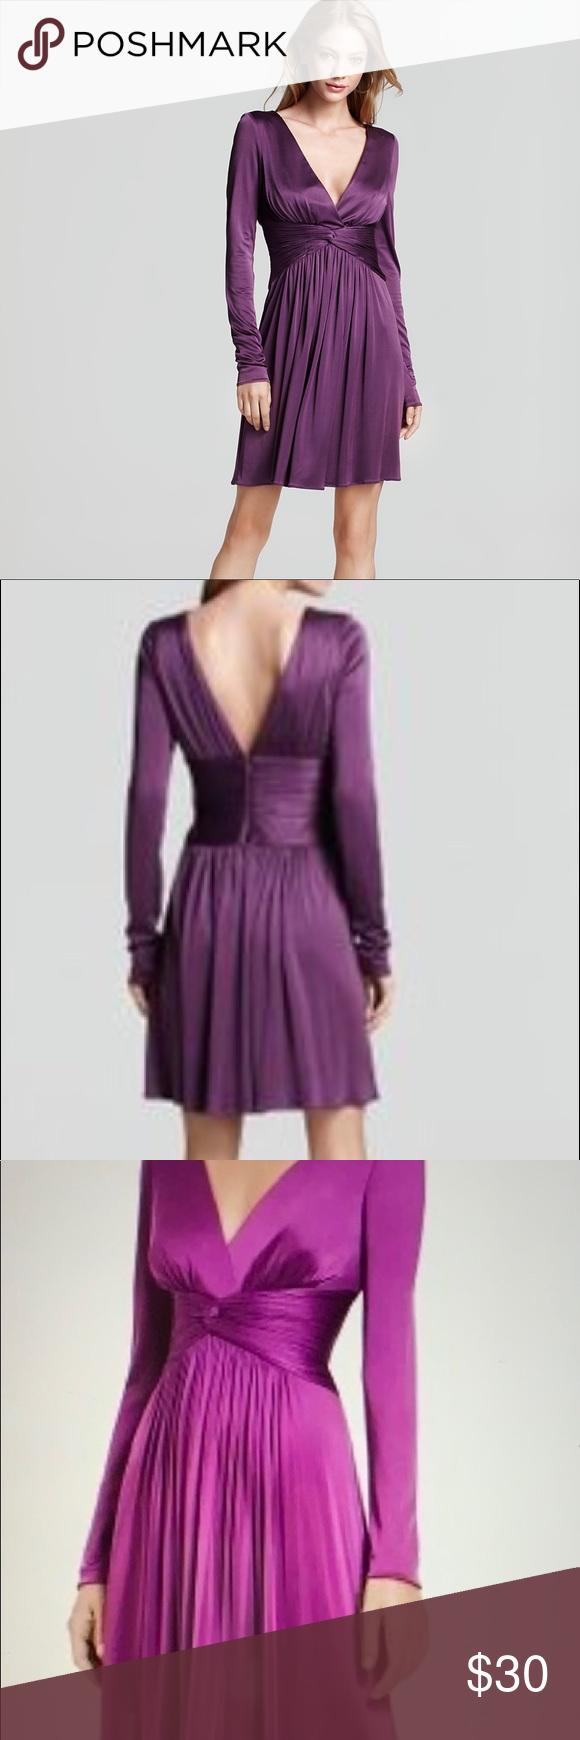 Sale Bcbgmaxazria Purple Long Sleeve V Neck Dress Dresses V Neck Dress Clothes Design [ 1740 x 580 Pixel ]